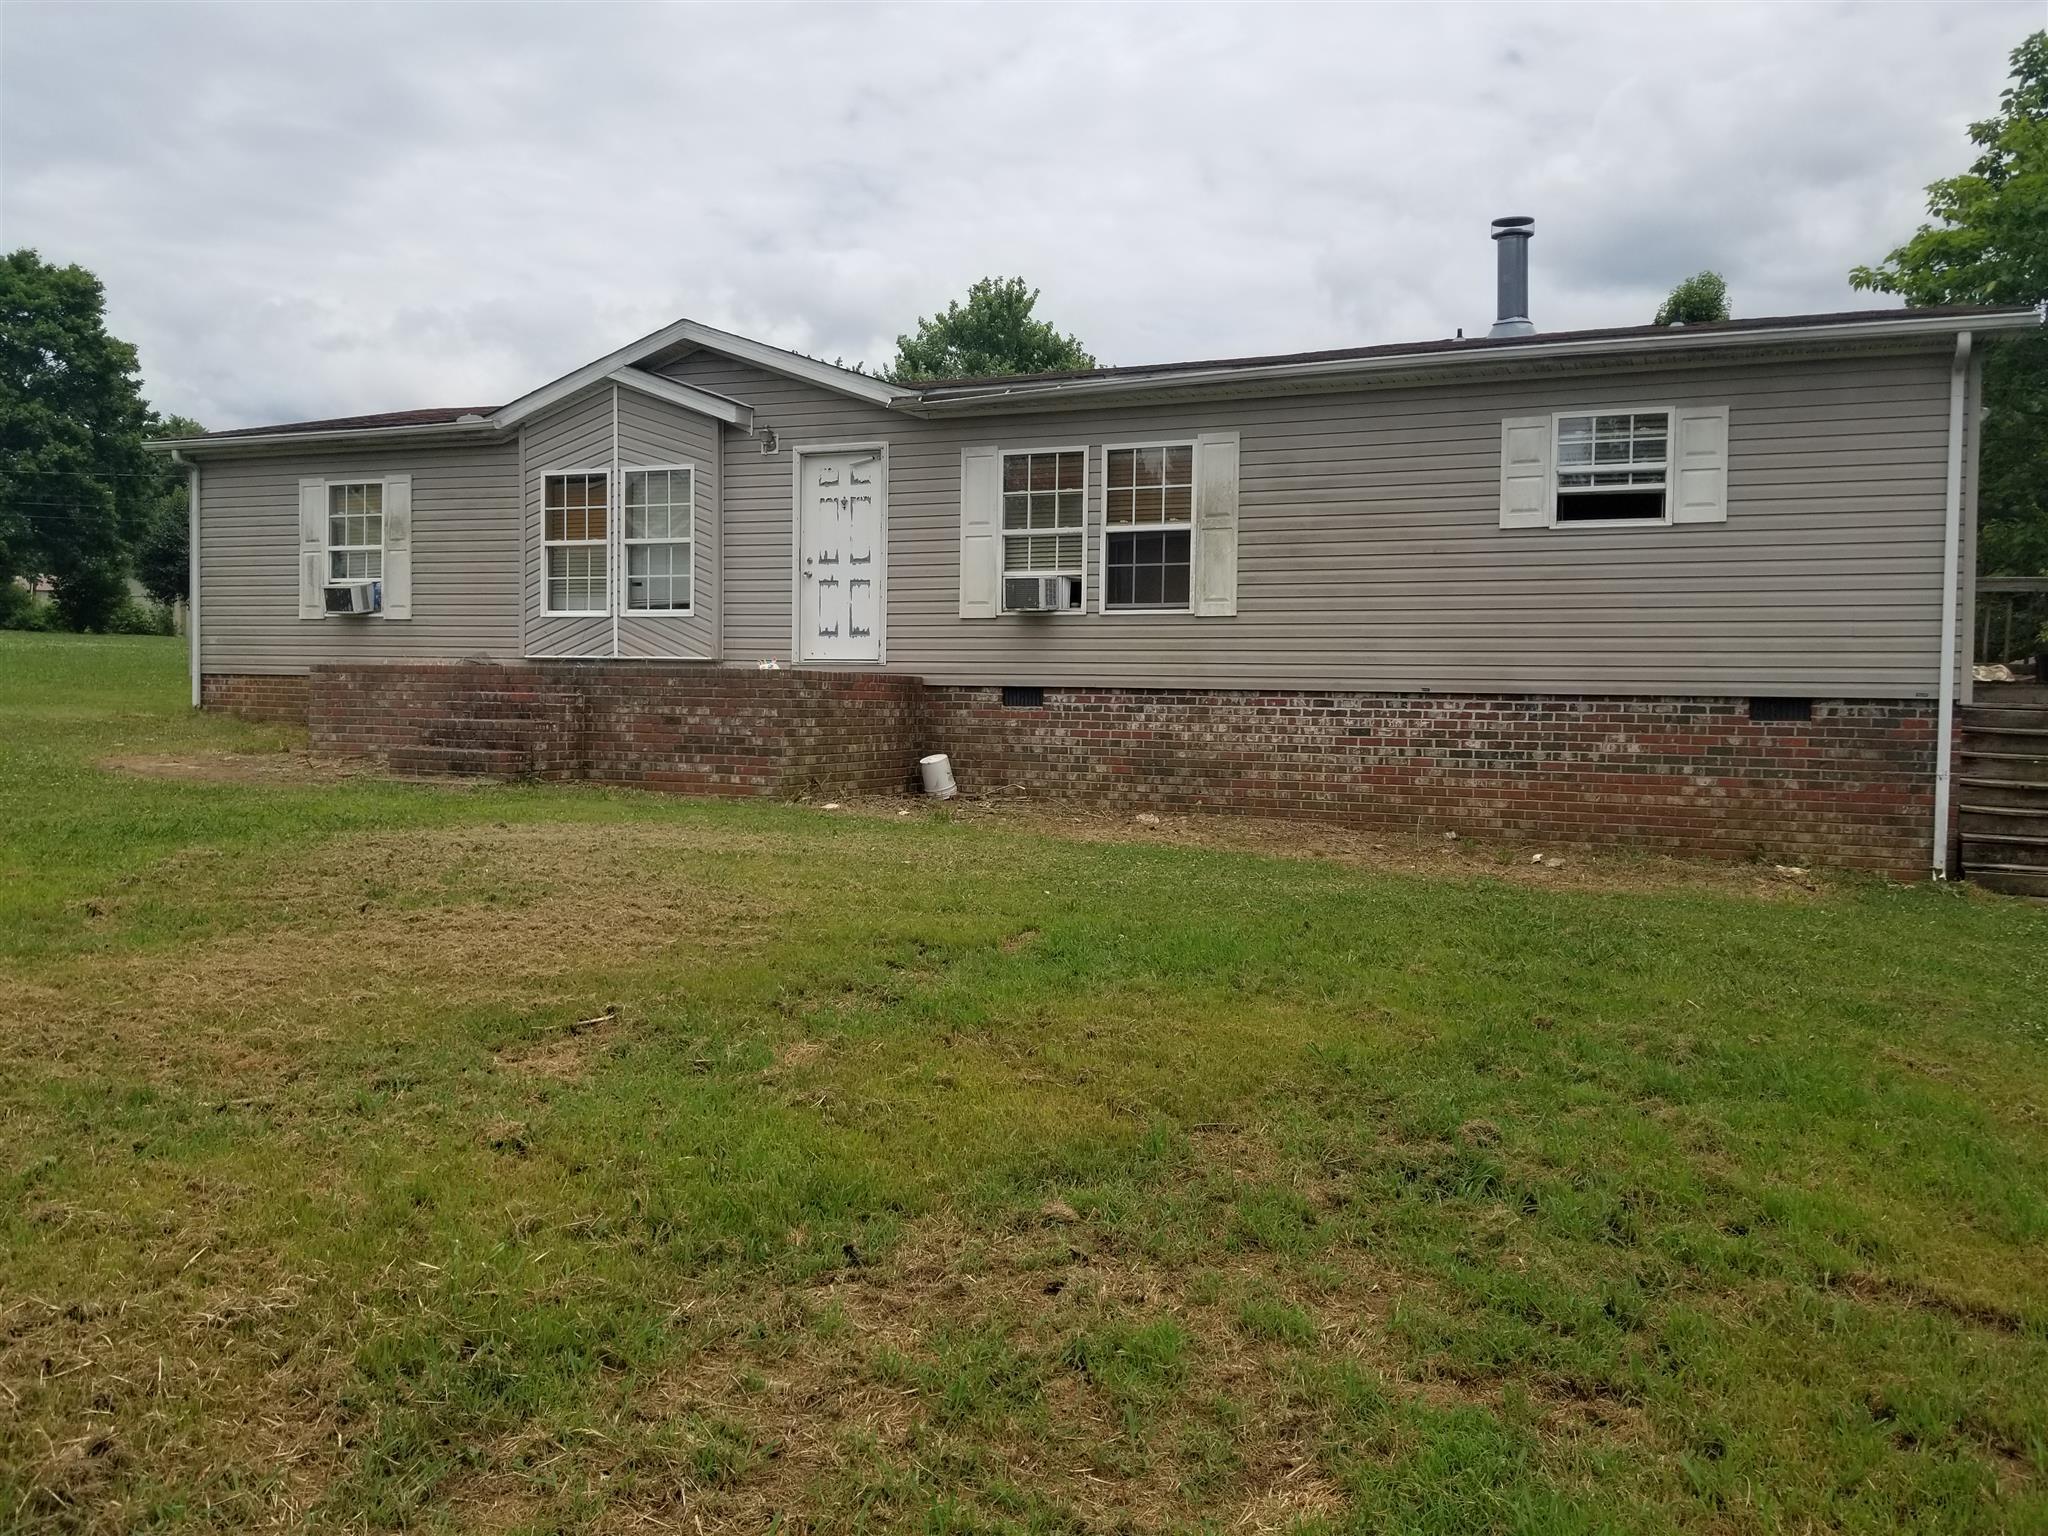 308 Allens Chapel Rd, Smithville, TN 37166 - Smithville, TN real estate listing